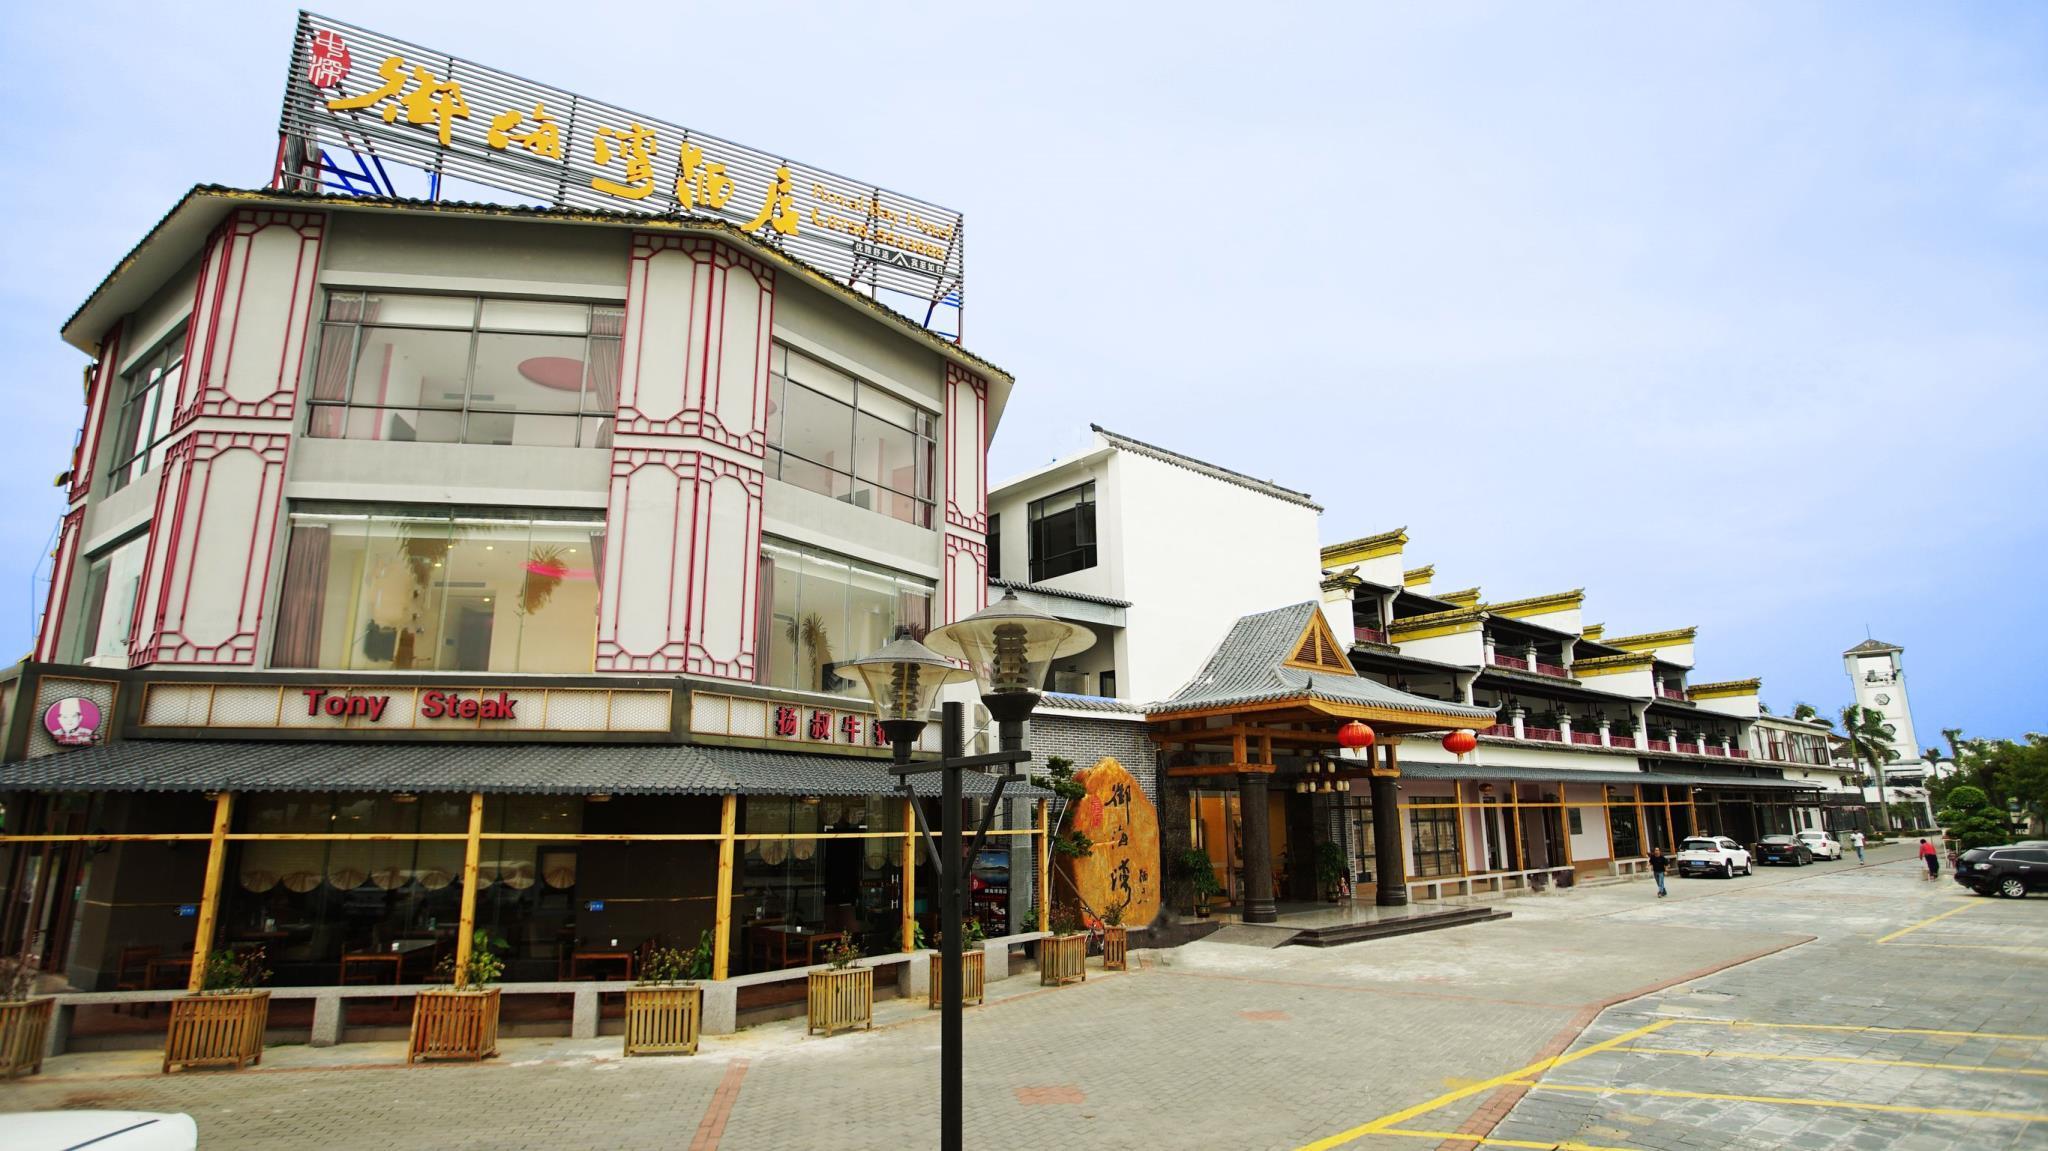 Royal Bay Hotel, Zhuhai